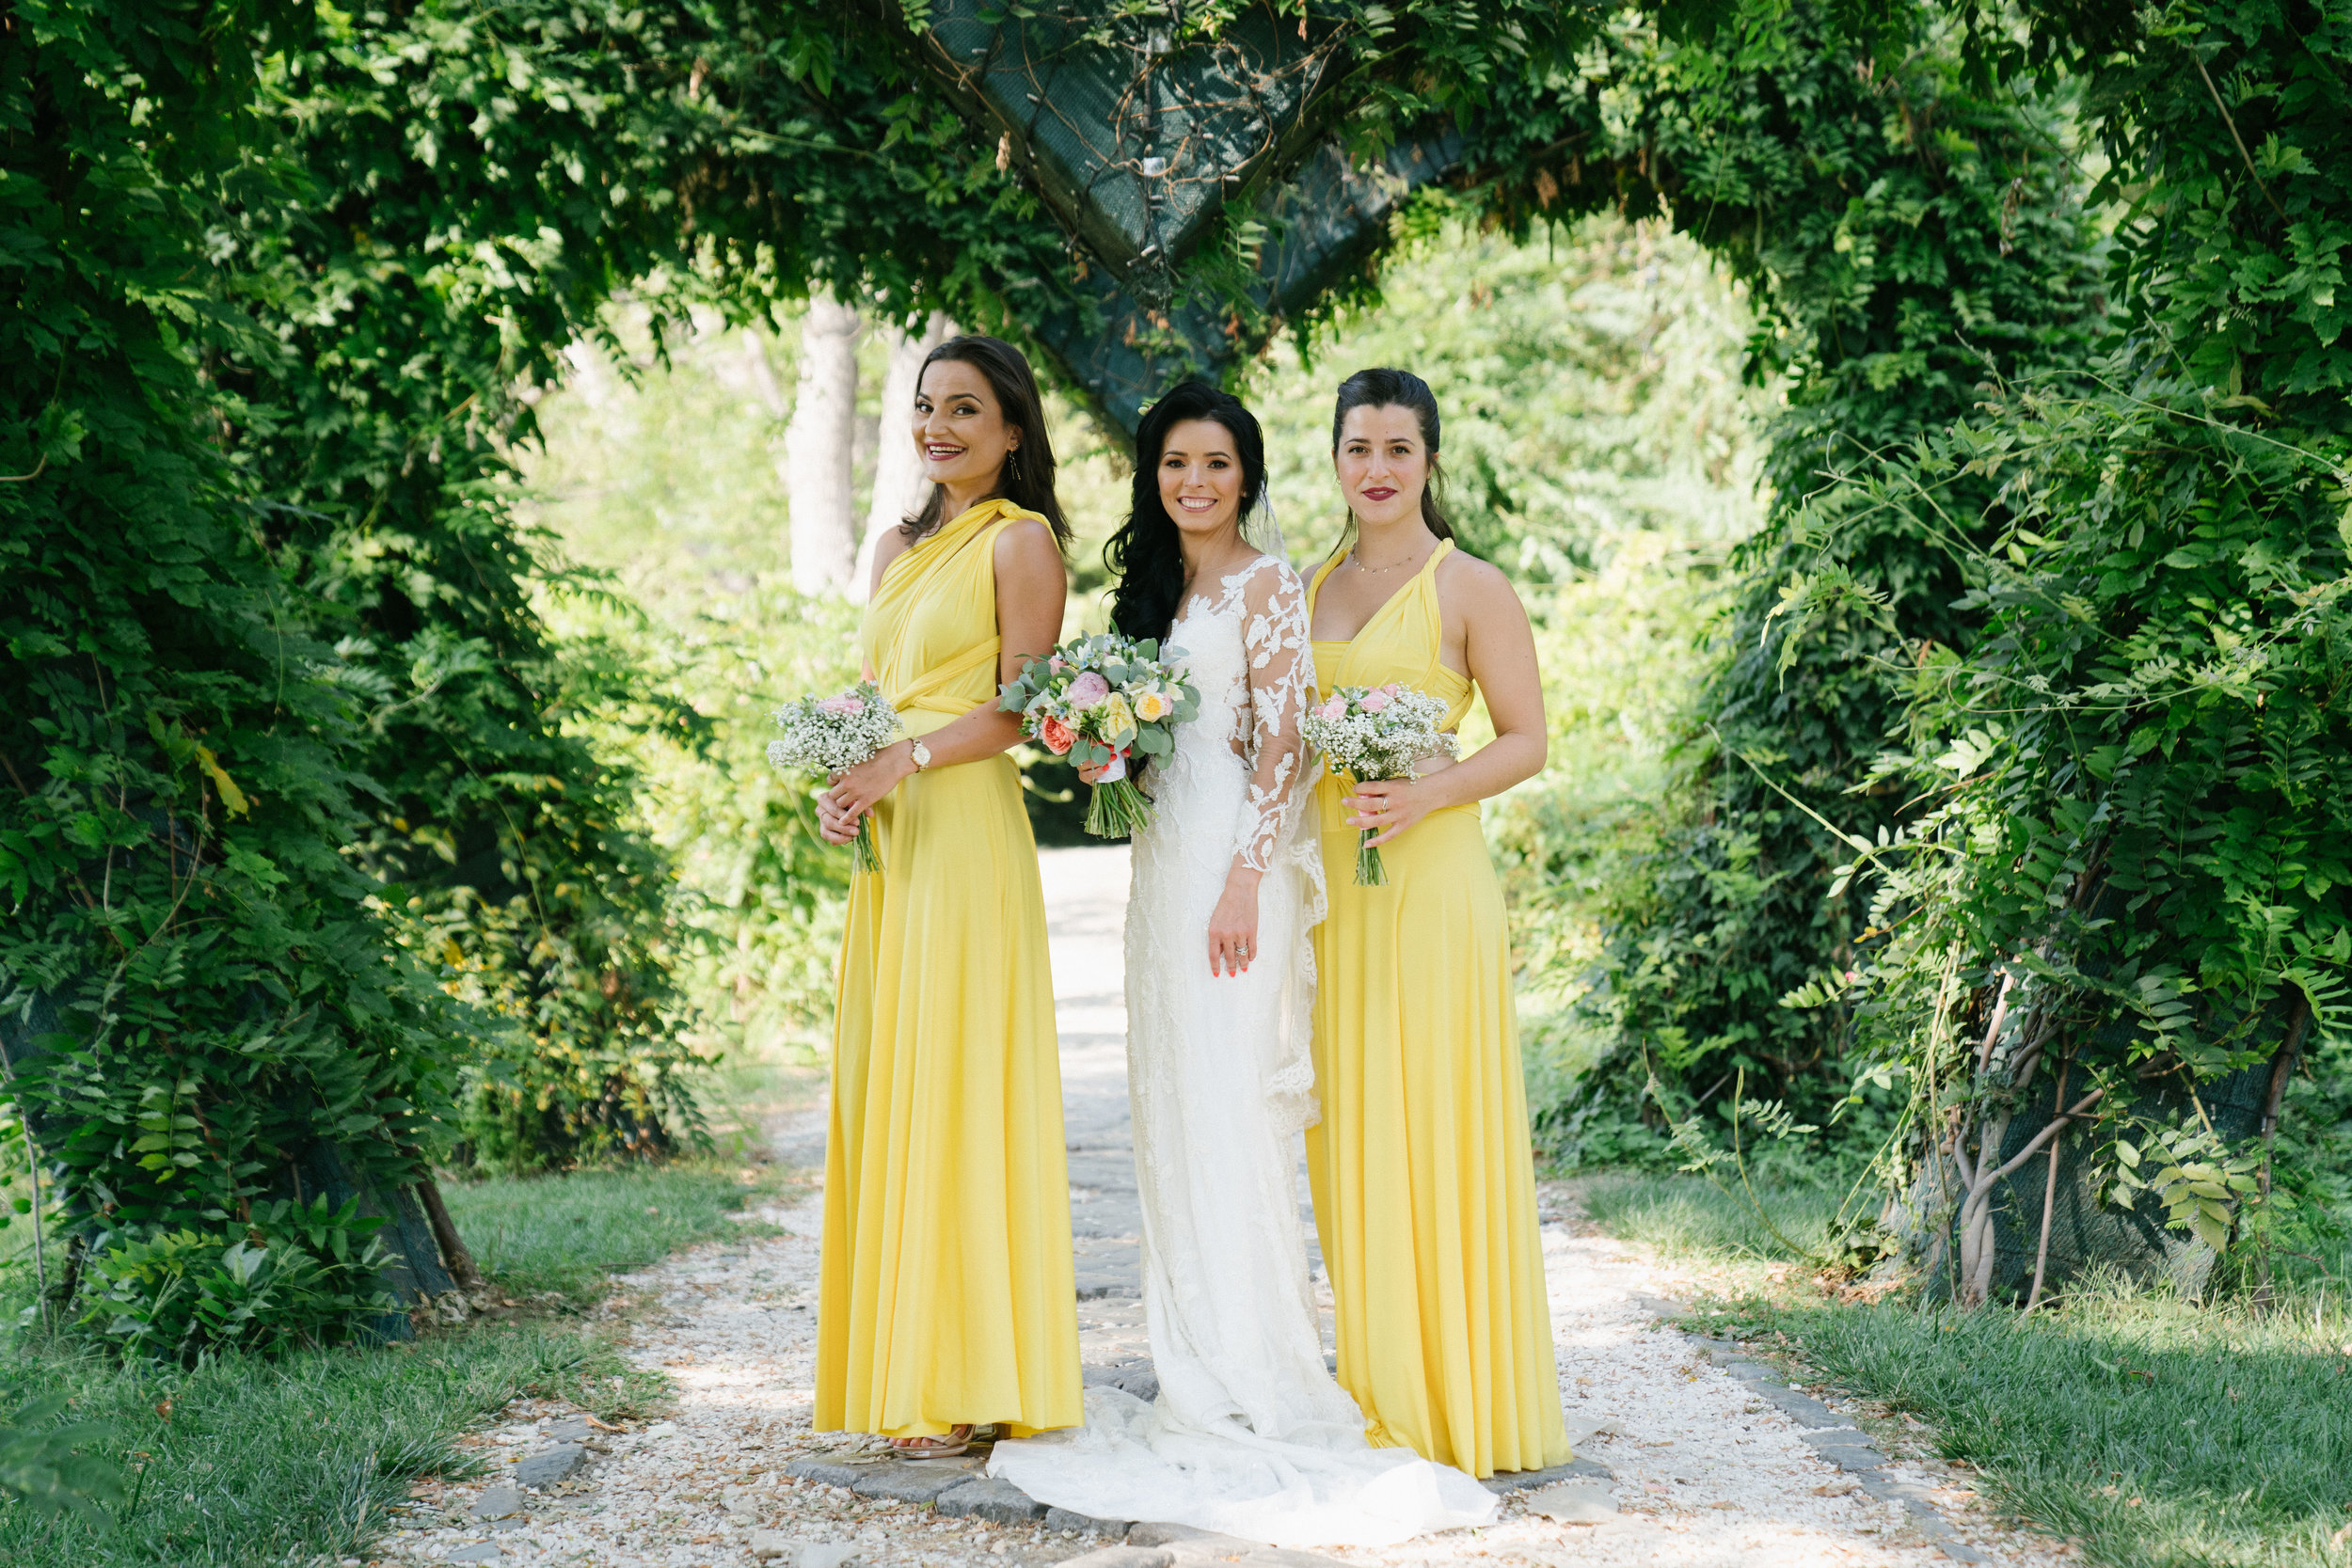 london-romania-destination-wedding-photographer-videographer-24